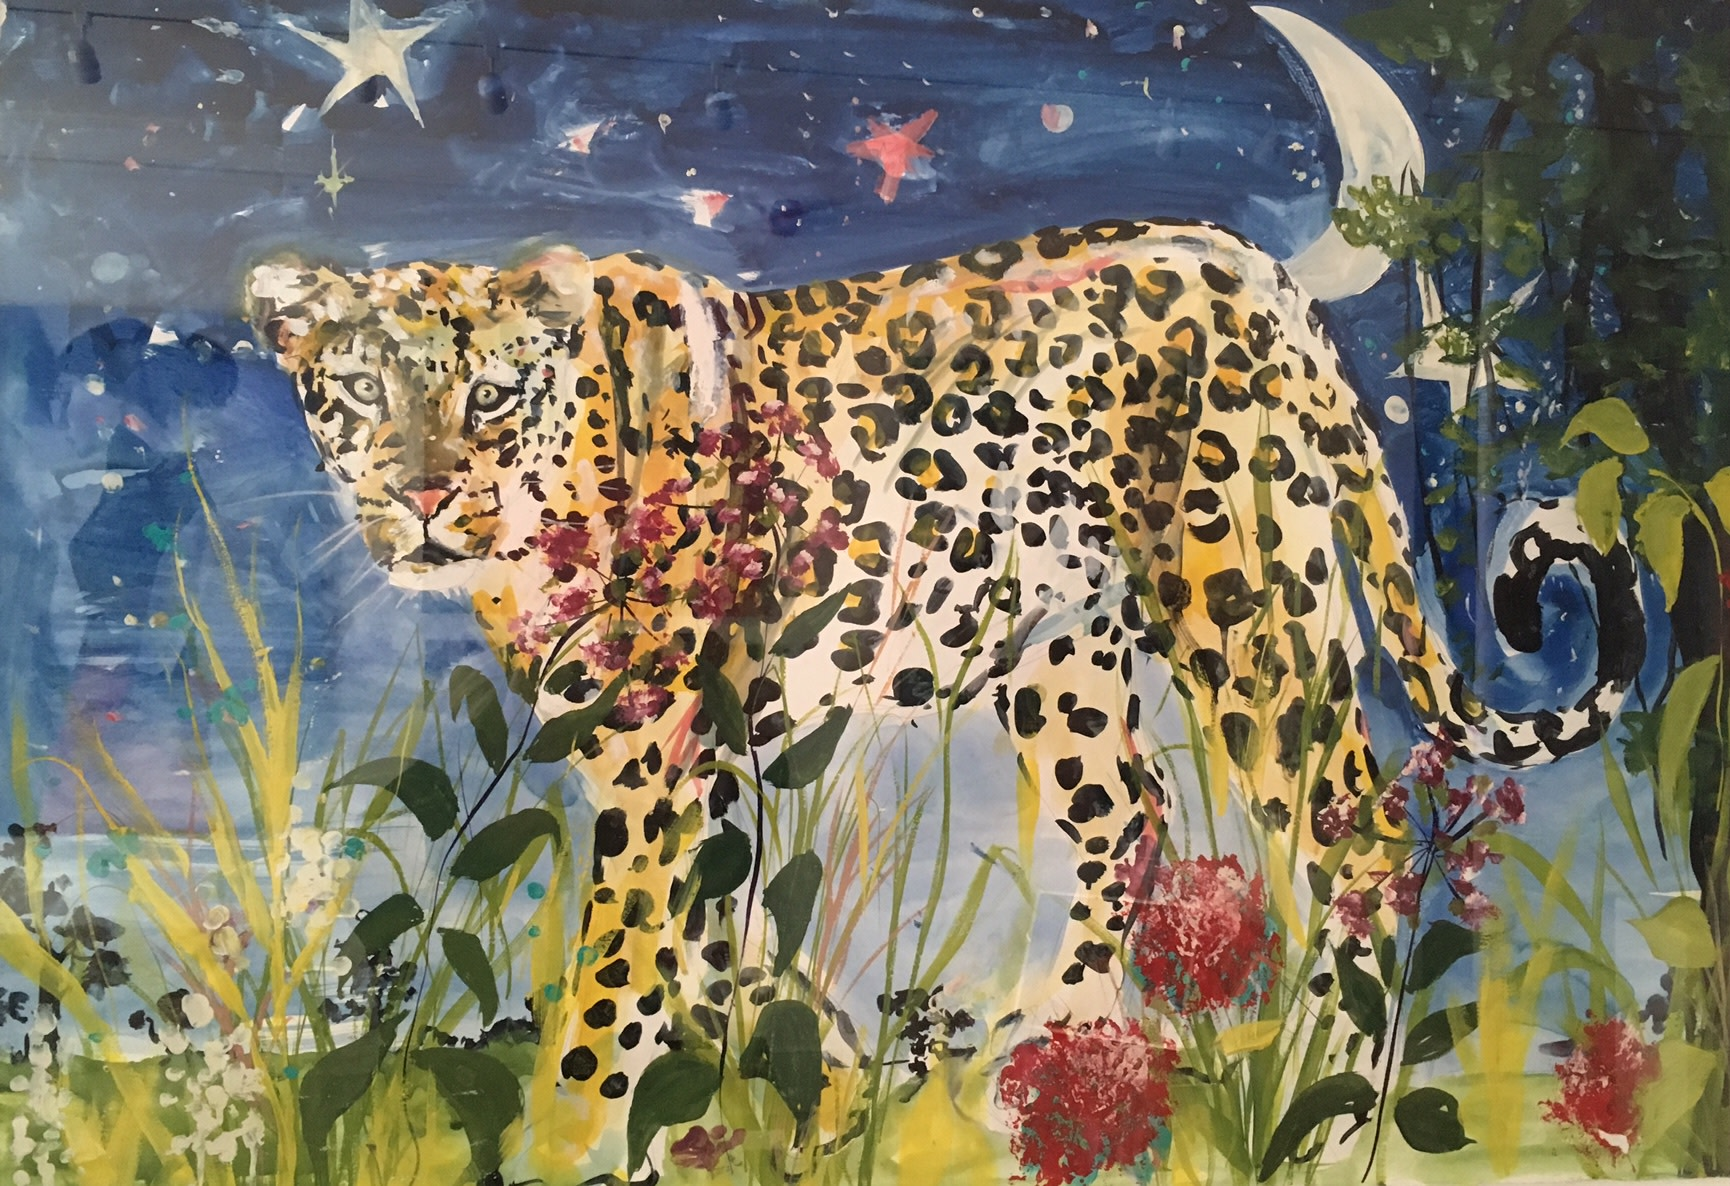 <span class=&#34;link fancybox-details-link&#34;><a href=&#34;/artists/39-millie-mccallum/works/325-millie-mccallum-leopard-in-night-sky/&#34;>View Detail Page</a></span><div class=&#34;artist&#34;><strong>Millie McCallum</strong></div> <div class=&#34;title&#34;><em>Leopard in Night Sky</em></div> <div class=&#34;medium&#34;>Watercolour (framed)</div> <div class=&#34;dimensions&#34;>70 x 100 cm (paper size)</div> <div class=&#34;edition_details&#34;></div><div class=&#34;price&#34;>£1,400.00</div>